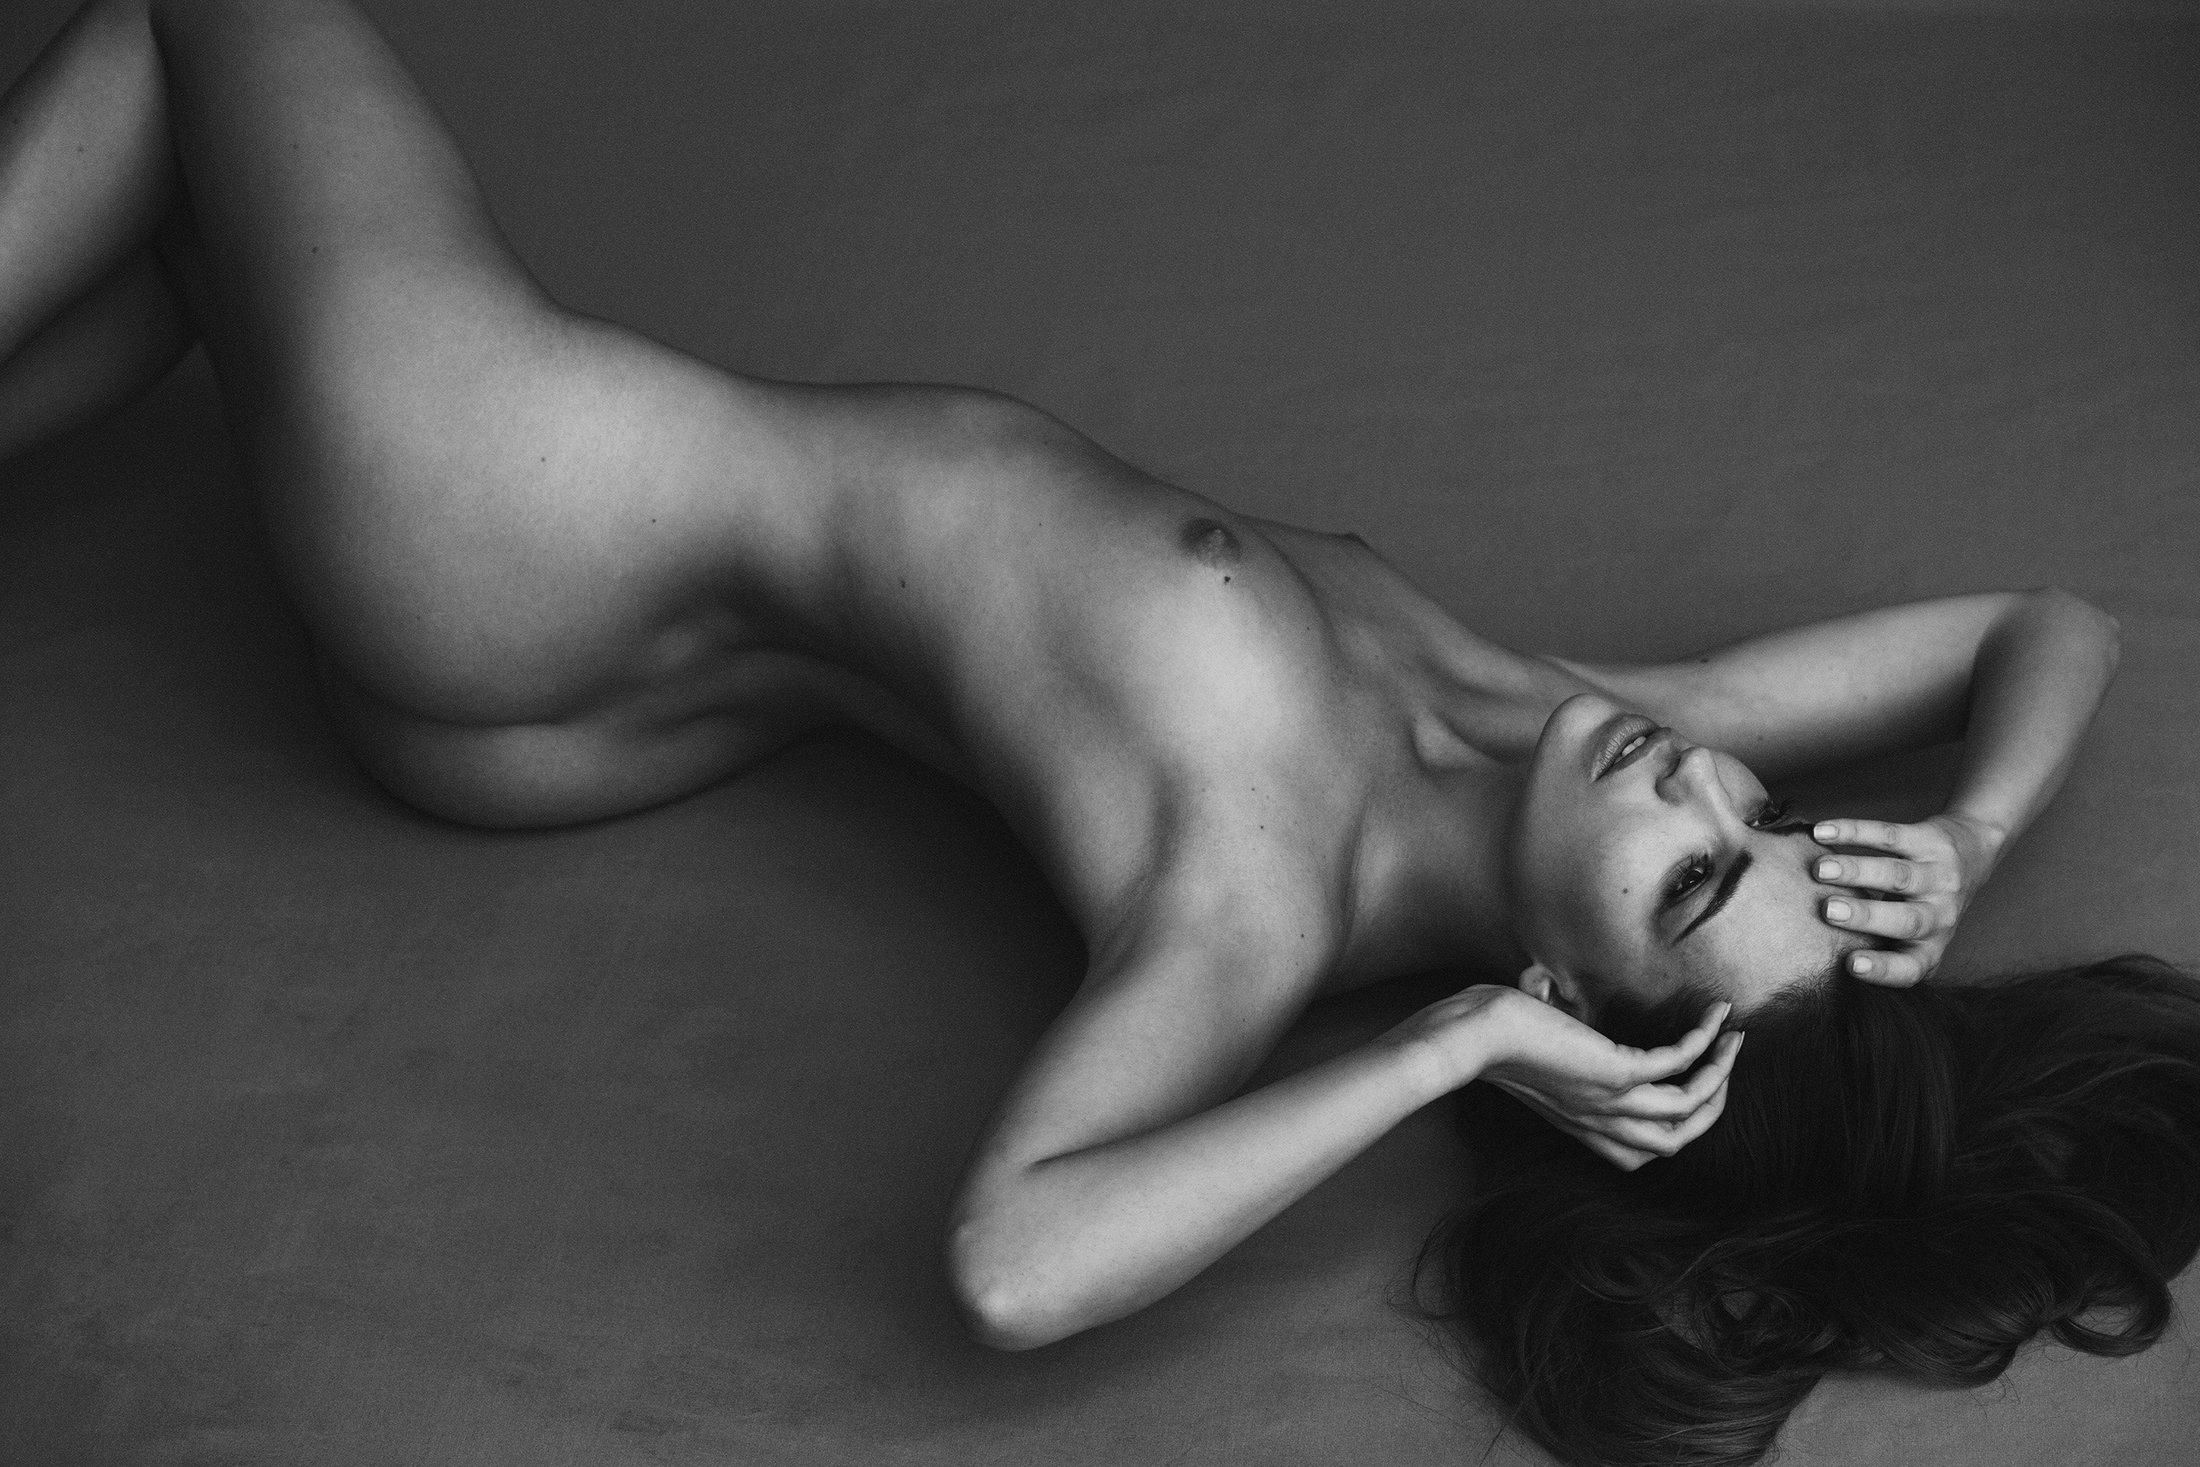 Audrey Bouette - Stefan Rappo photoshoot